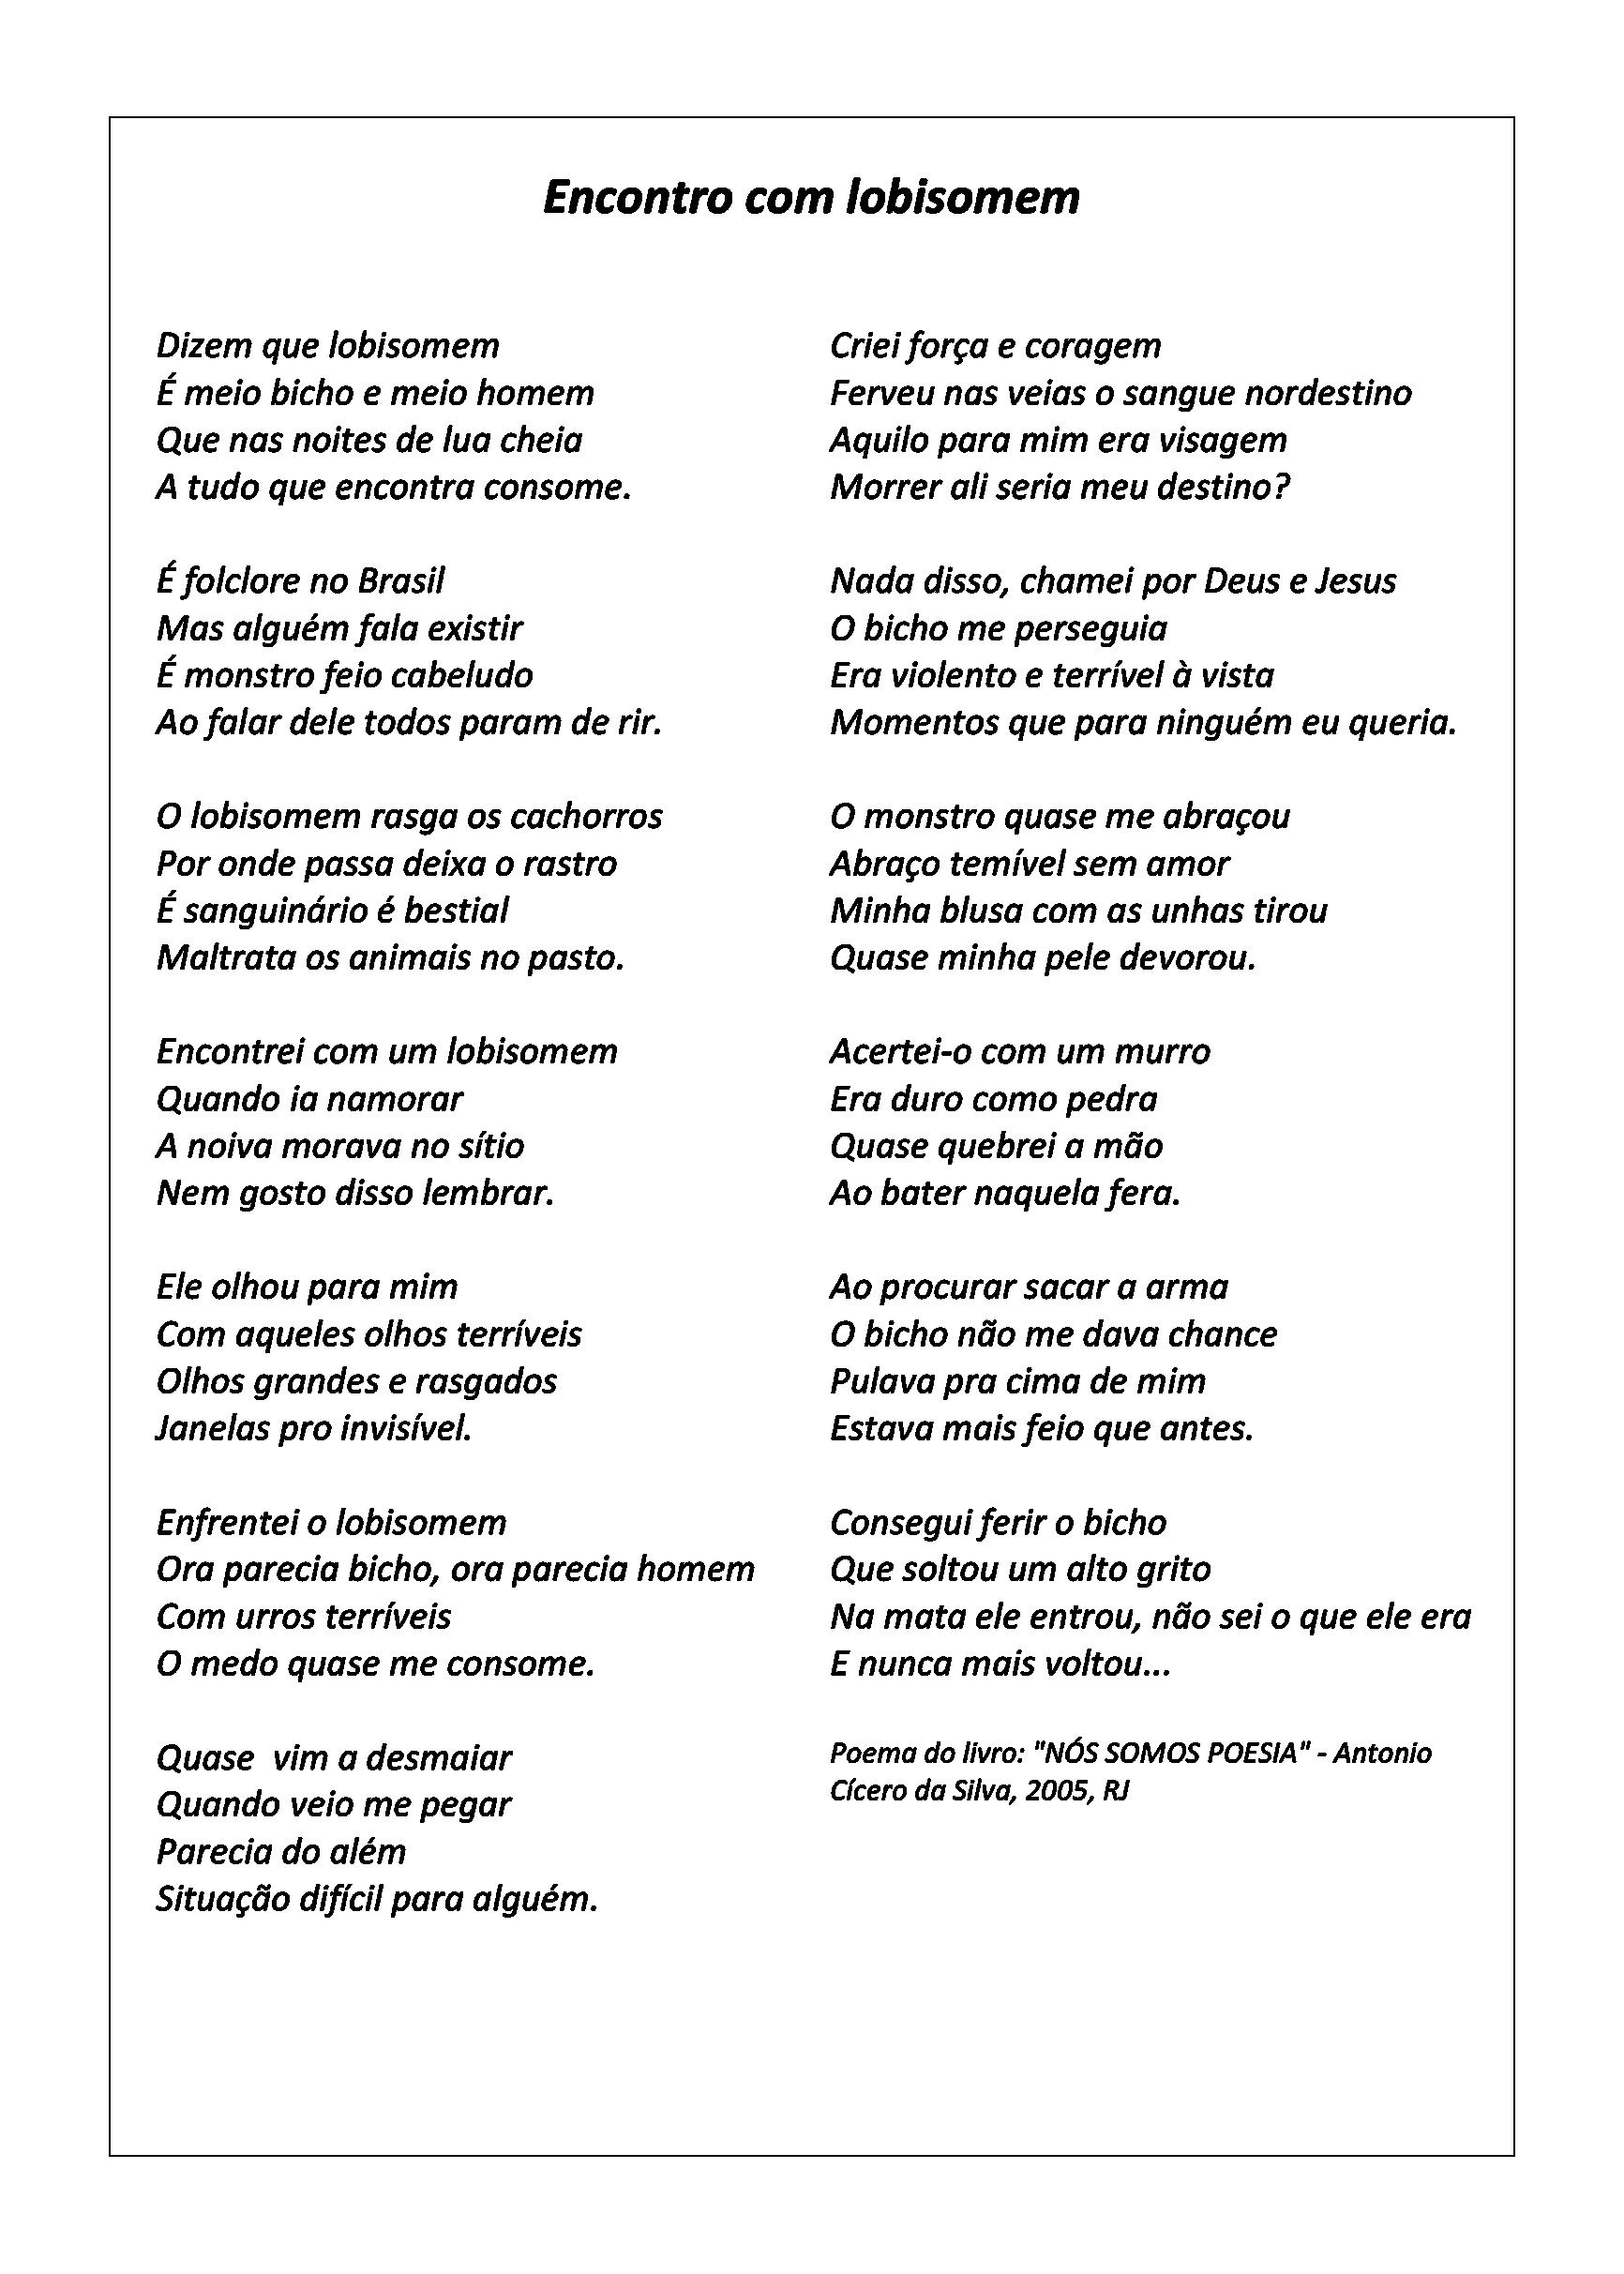 0191-poema-folclore-encontro-lobisomem